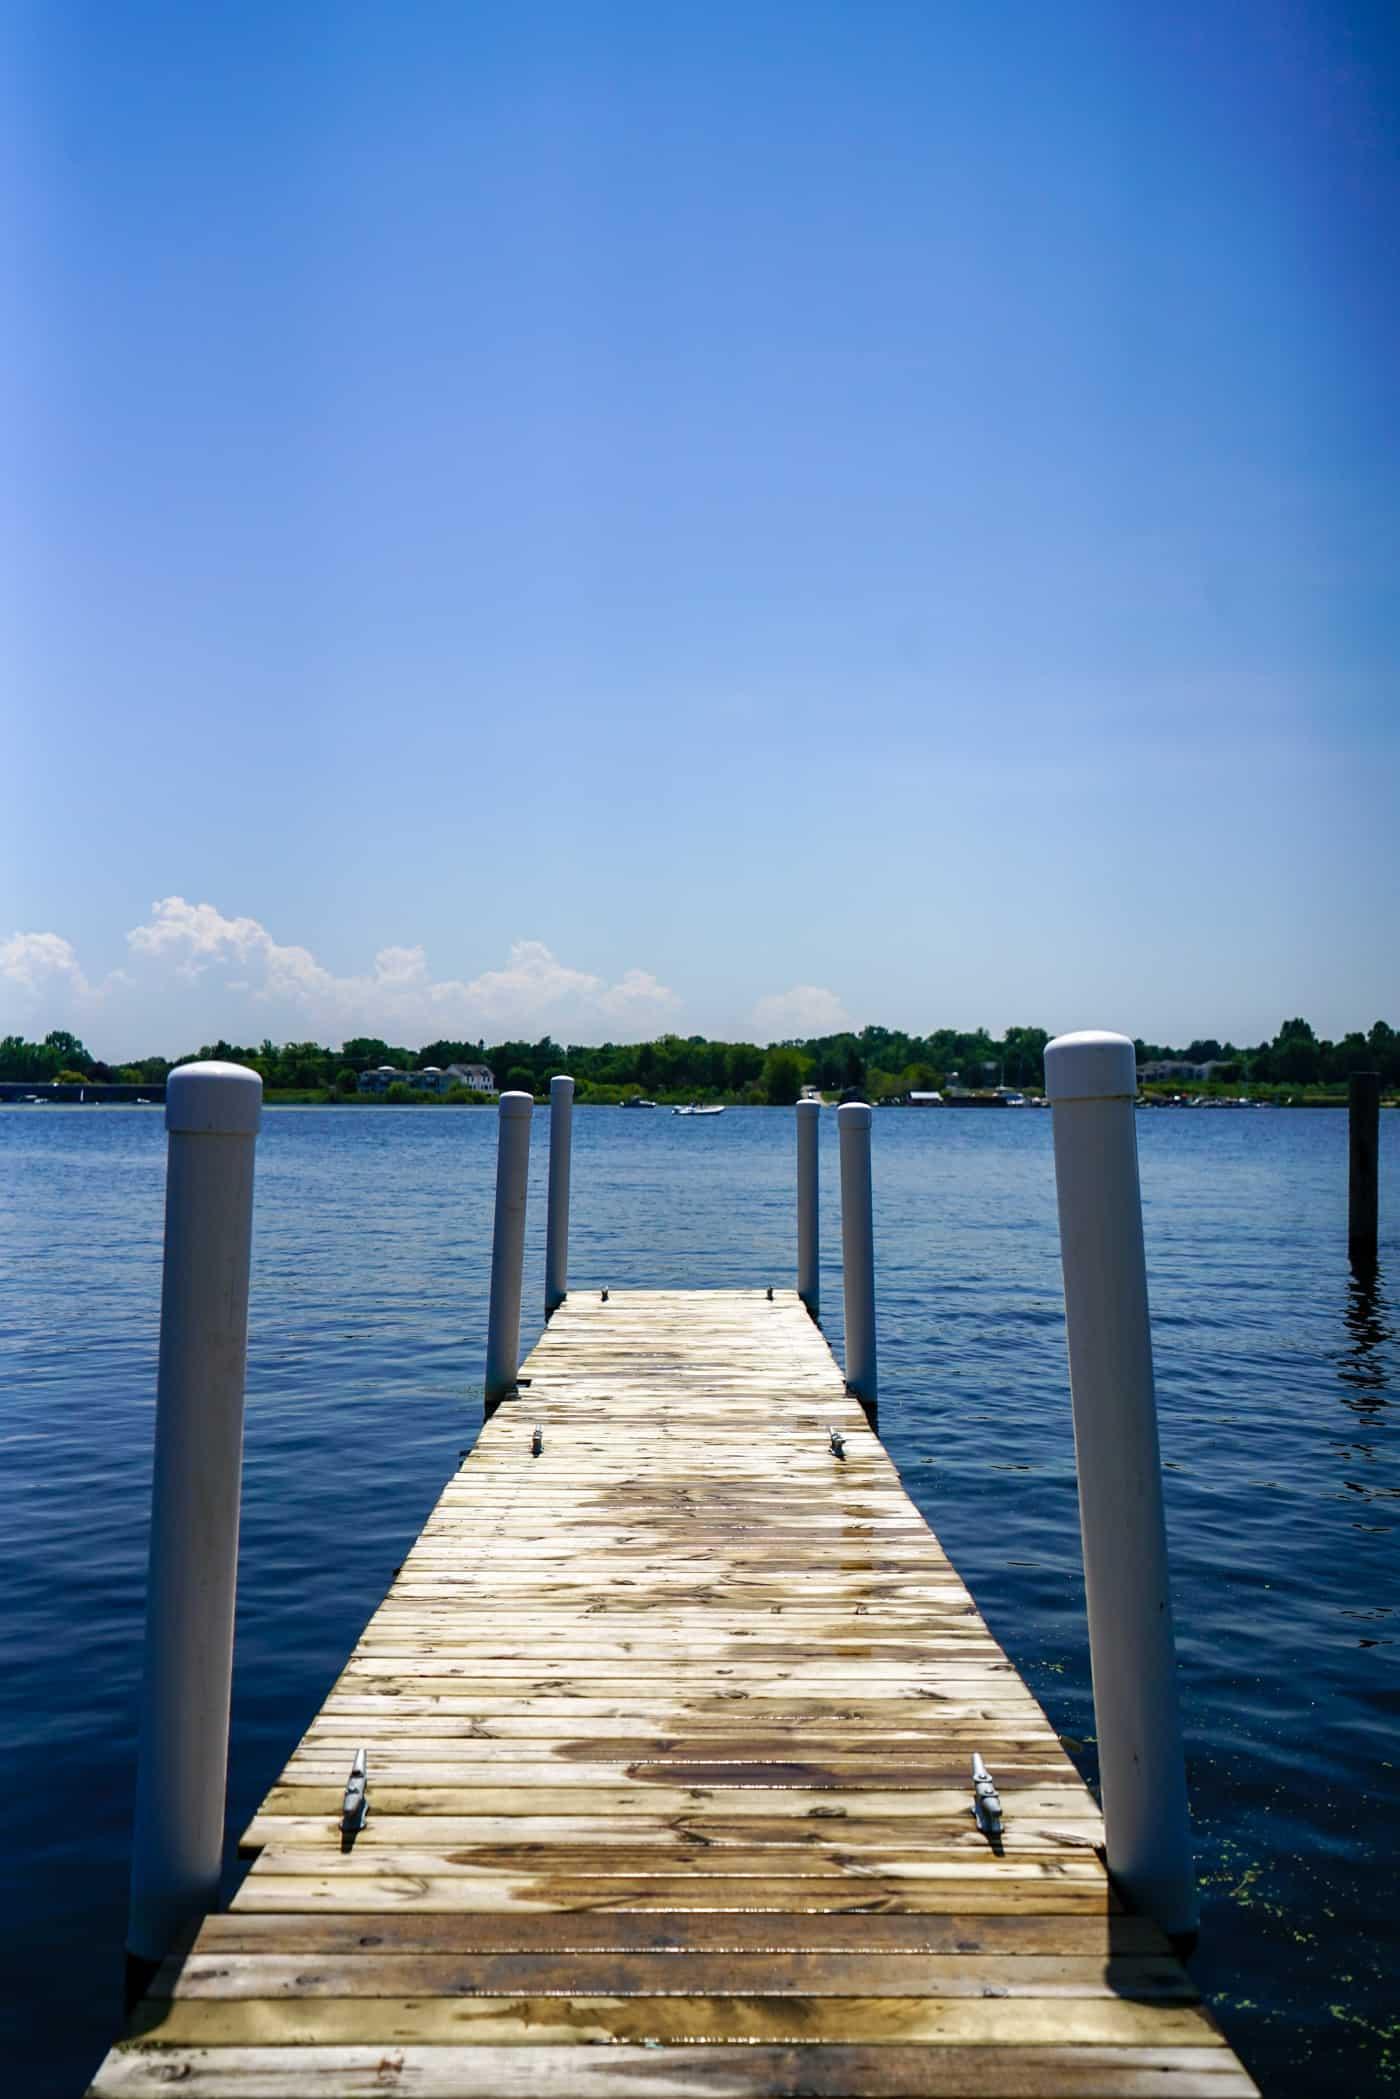 Saugatuck Michigan lakefront and dock